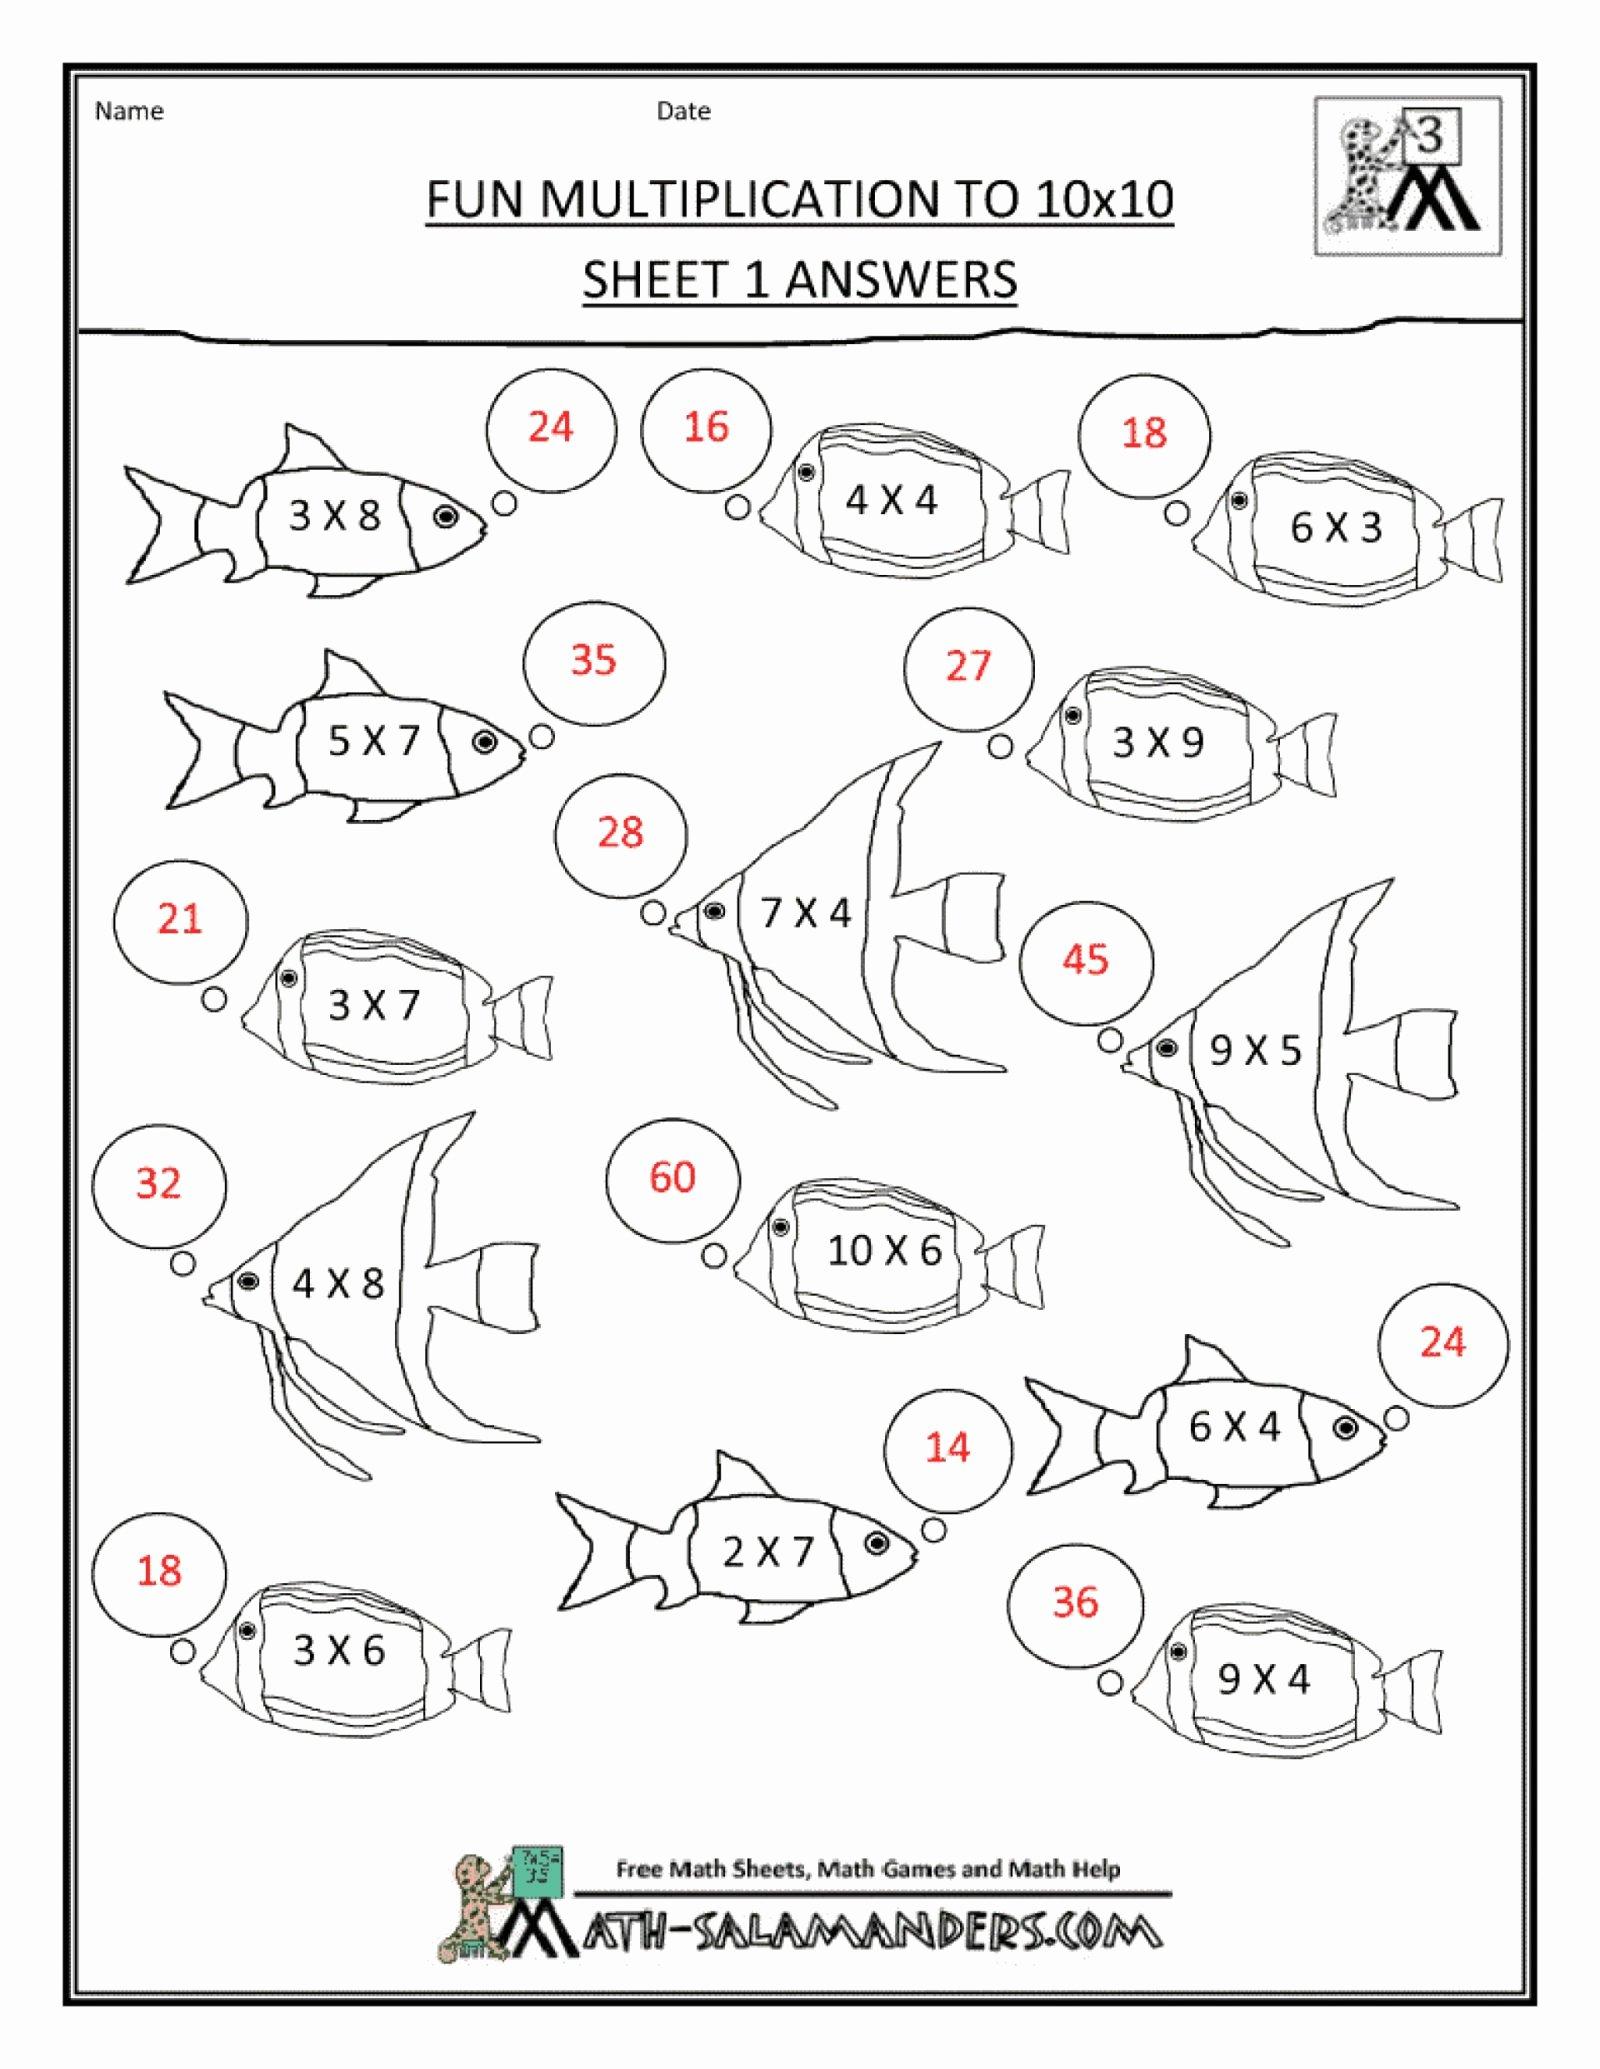 Music Worksheets for Middle School Inspirational Worksheet Kids Worksheet Simplifying Radicals with